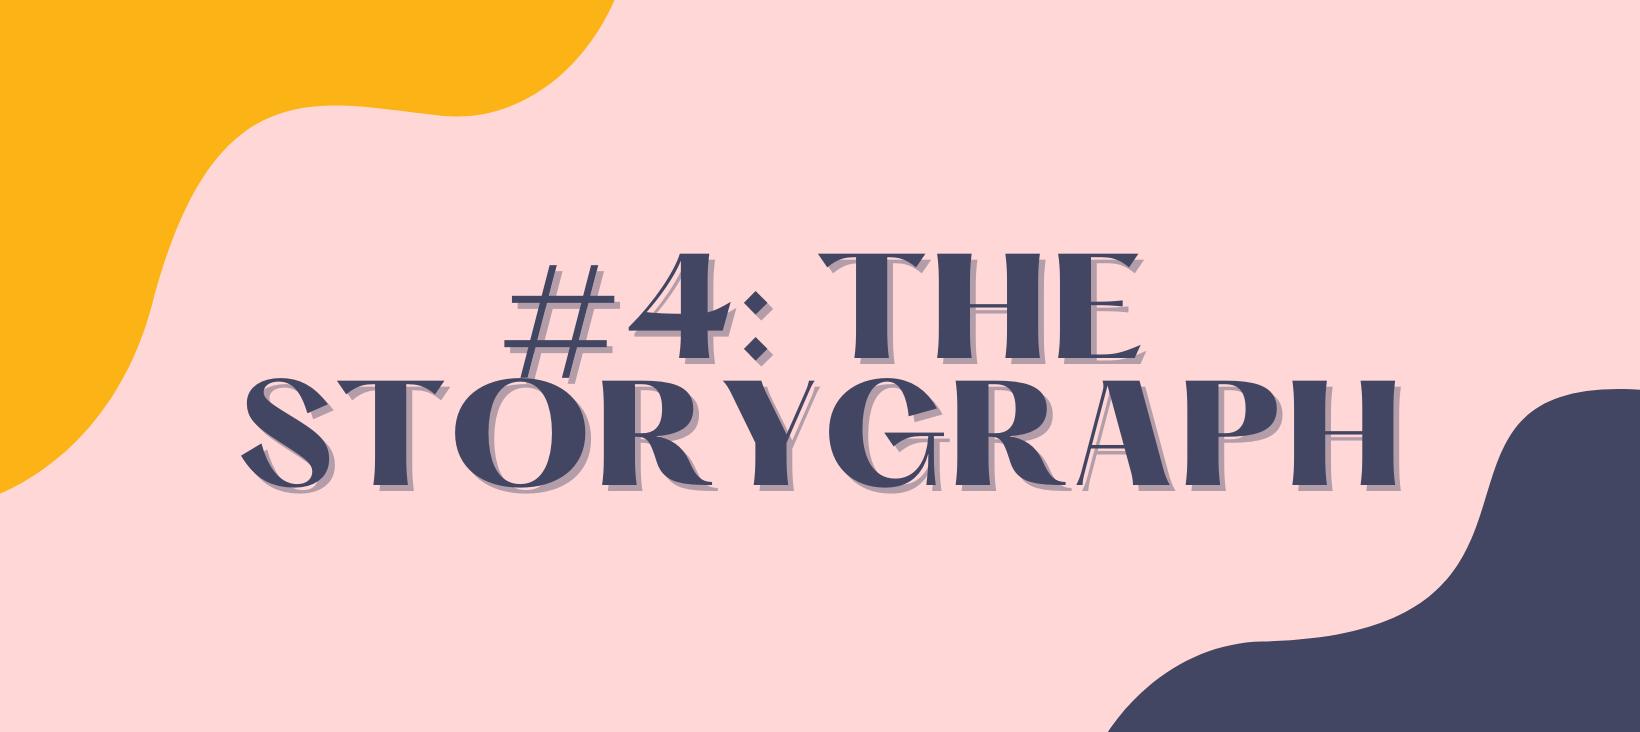 #4: The StoryGraph